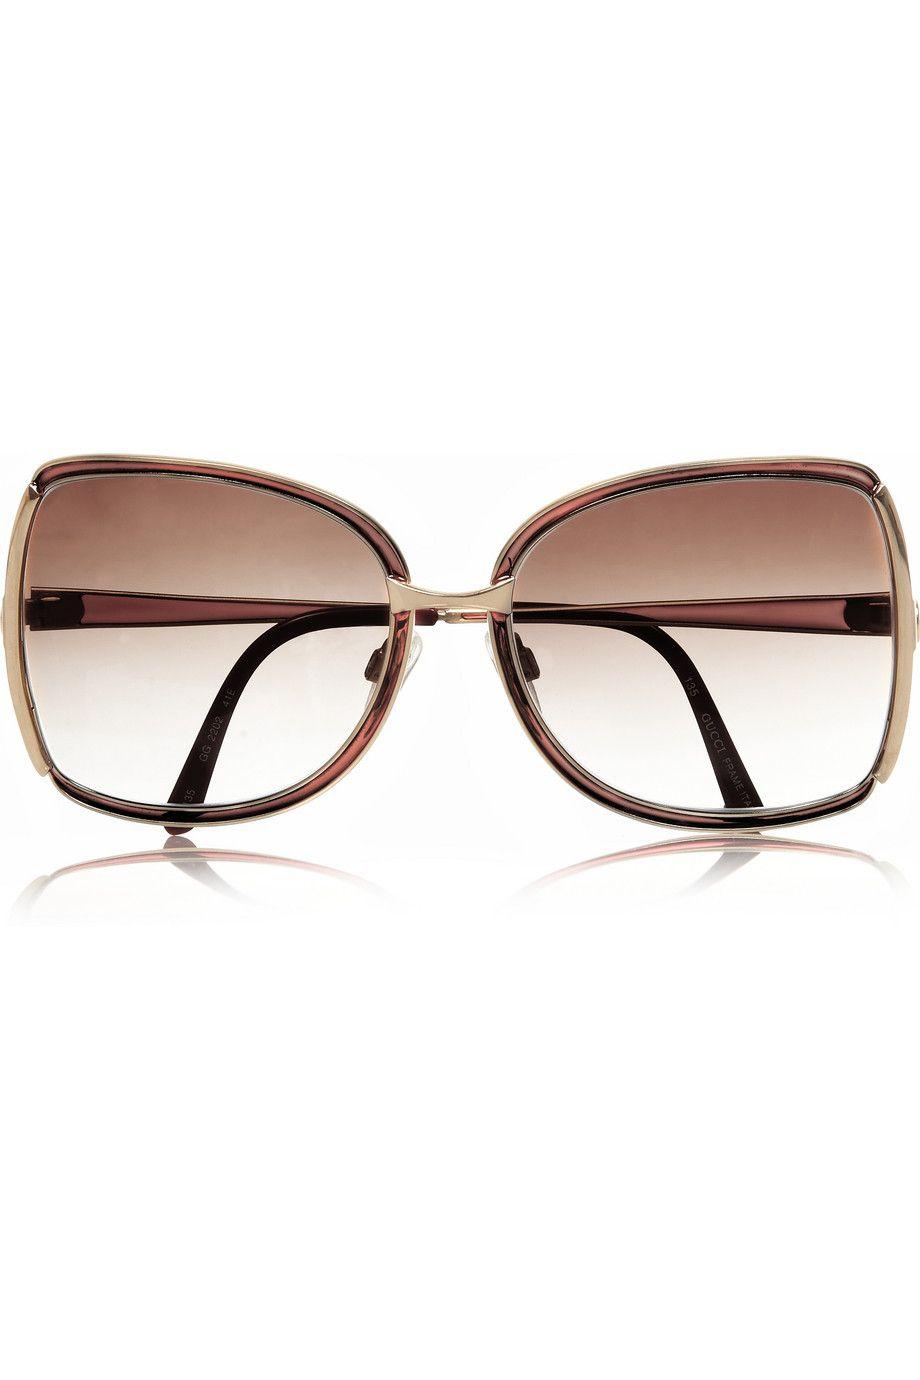 952148fa1e retro sun vintage gucci shades | LENTES SOL | Gafas gucci, Gafas de ...